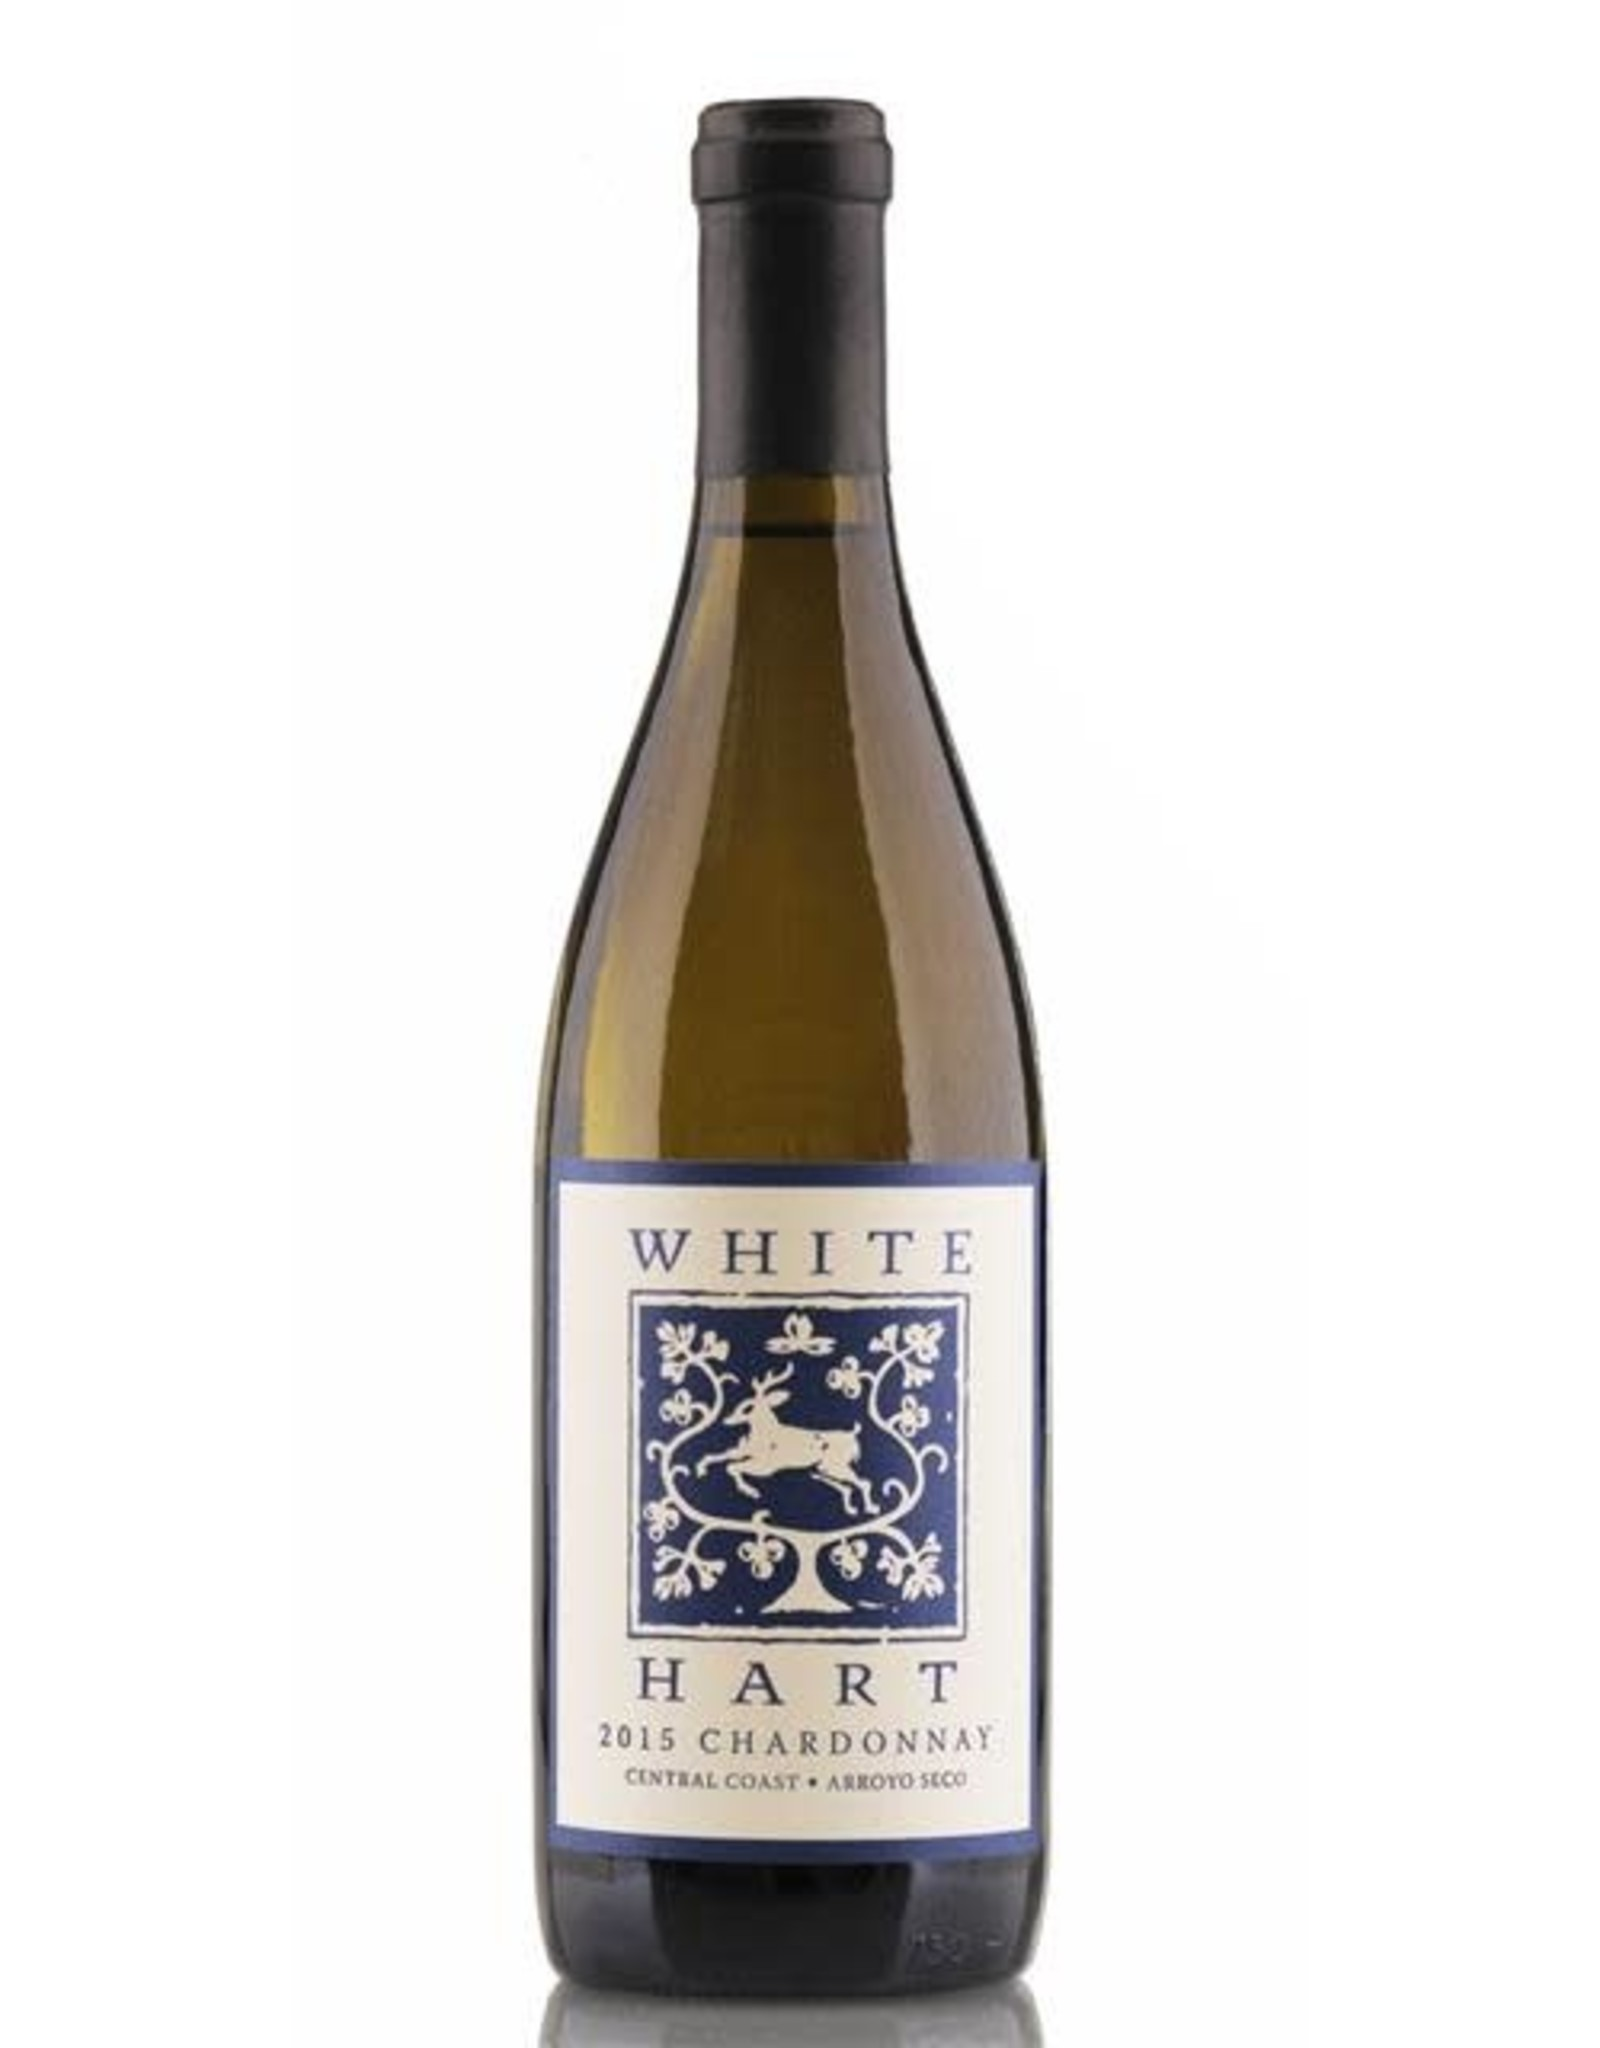 WHITE HART 2015 CHARDONNAY 750ML